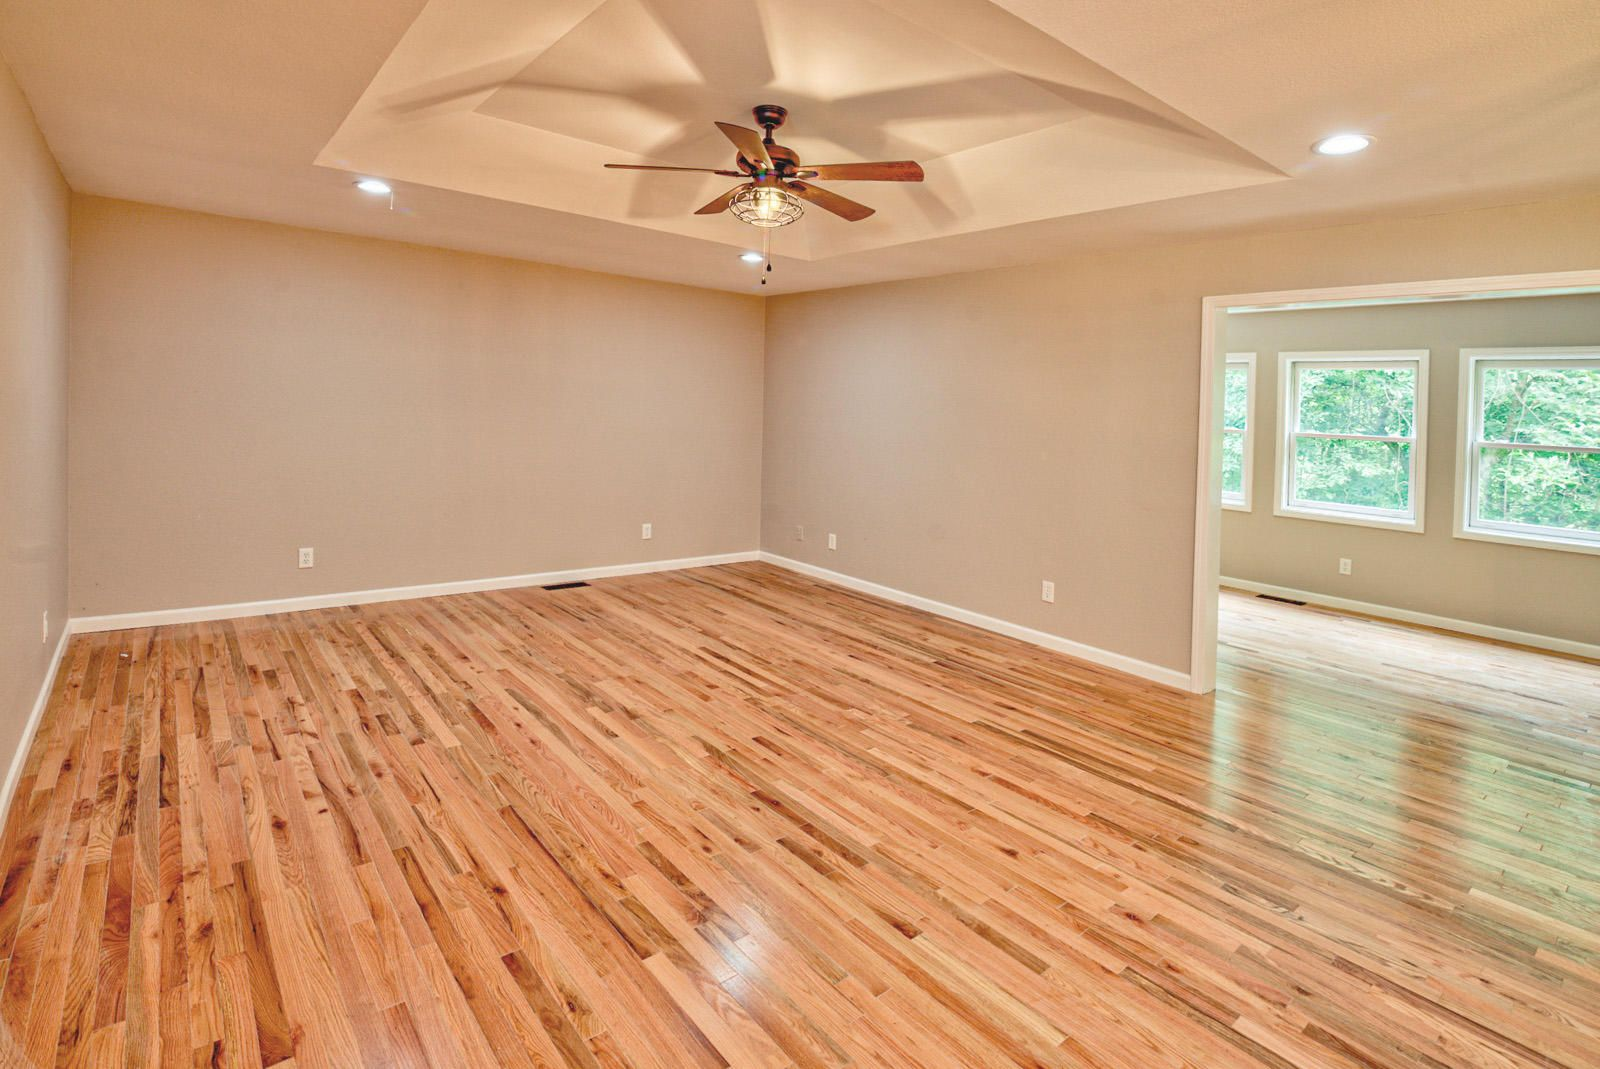 Int Living Room-1